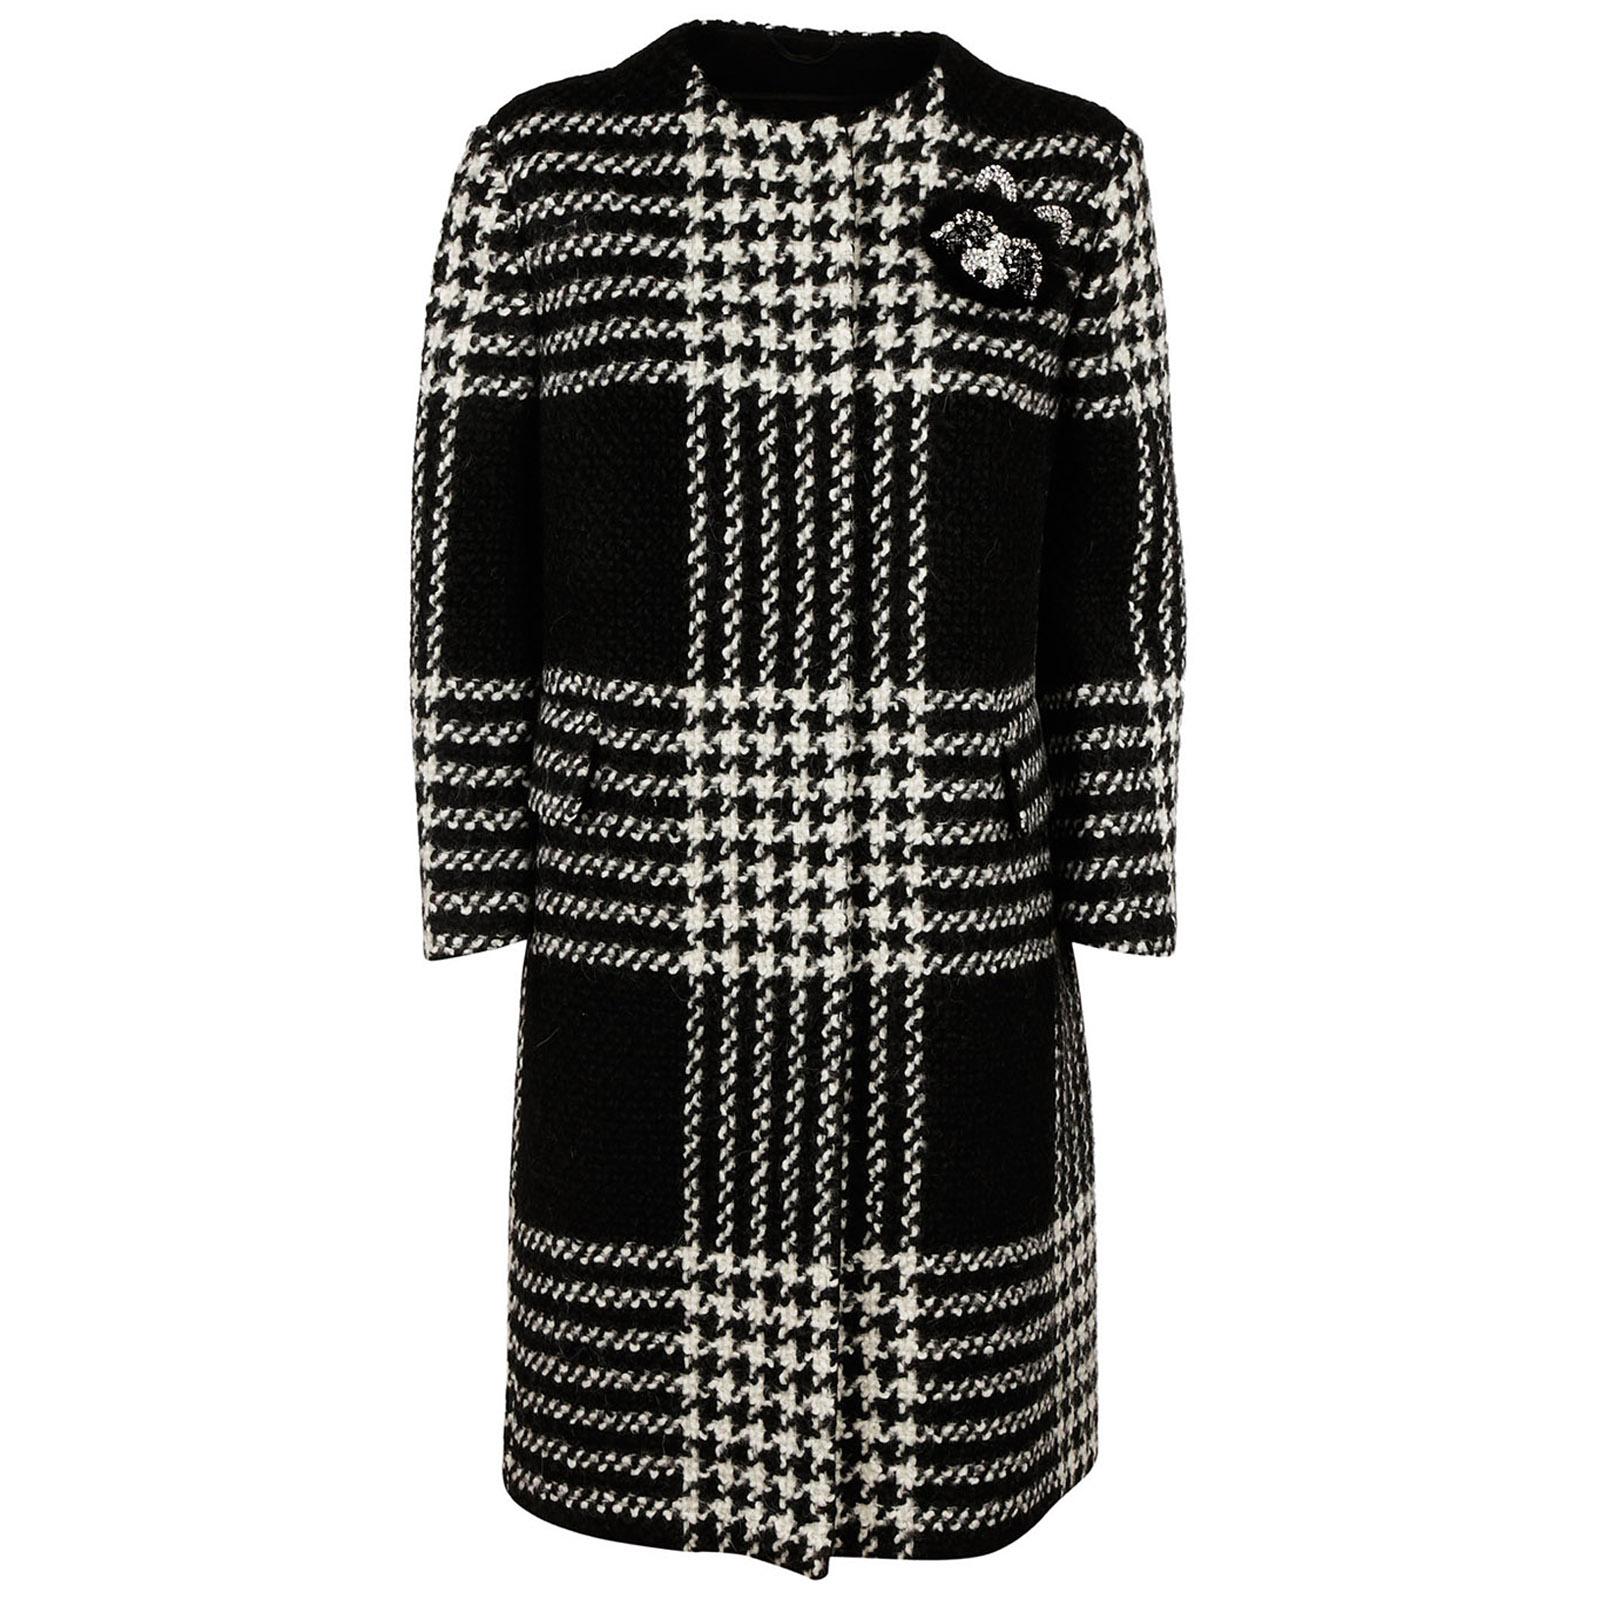 Cappotto donna in lana pied de poule